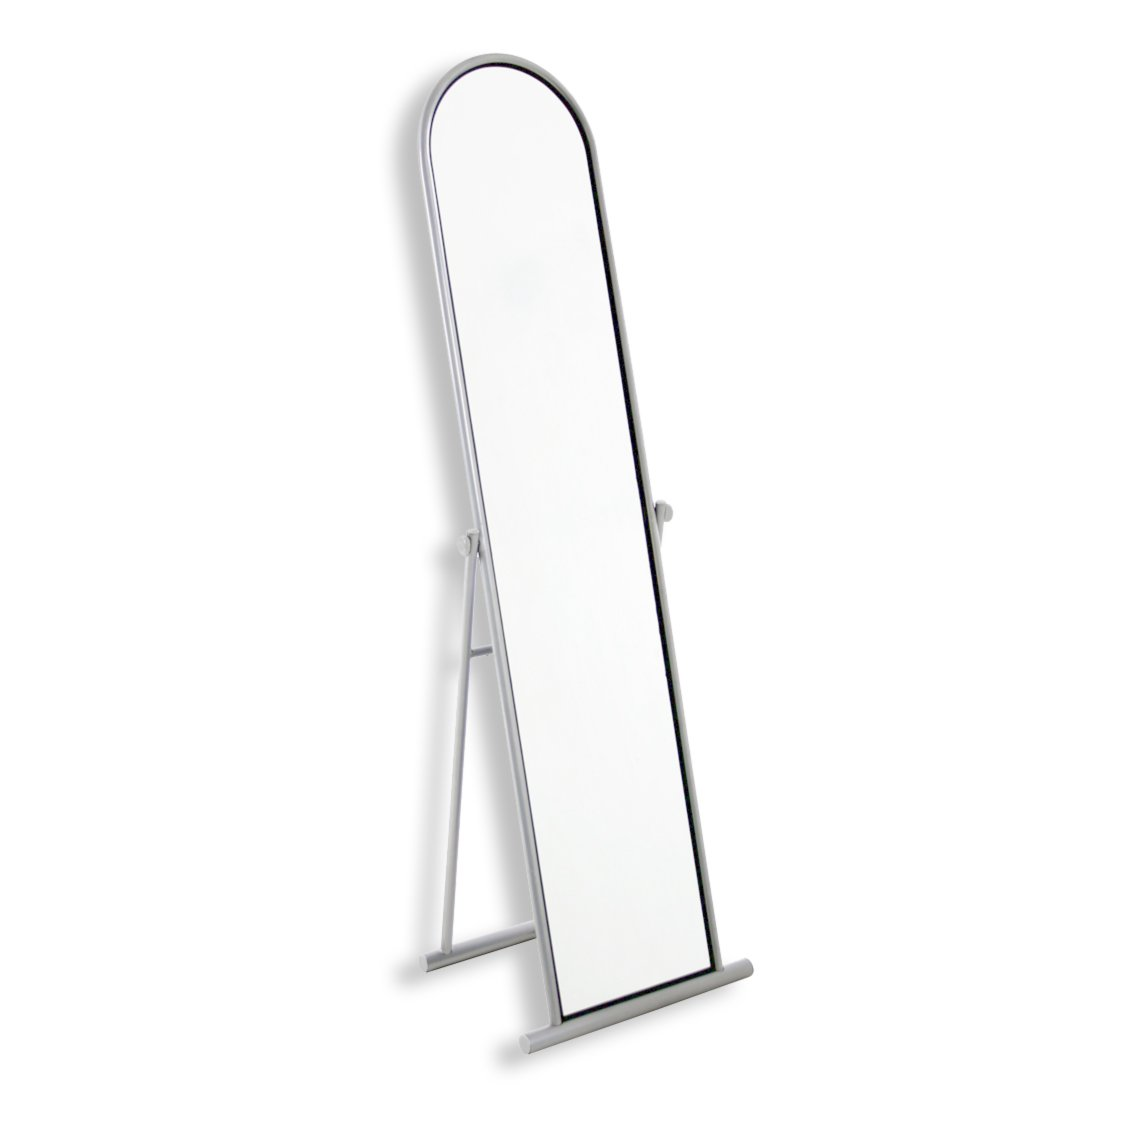 standspiegel spectrum standspiegel spiegel deko. Black Bedroom Furniture Sets. Home Design Ideas